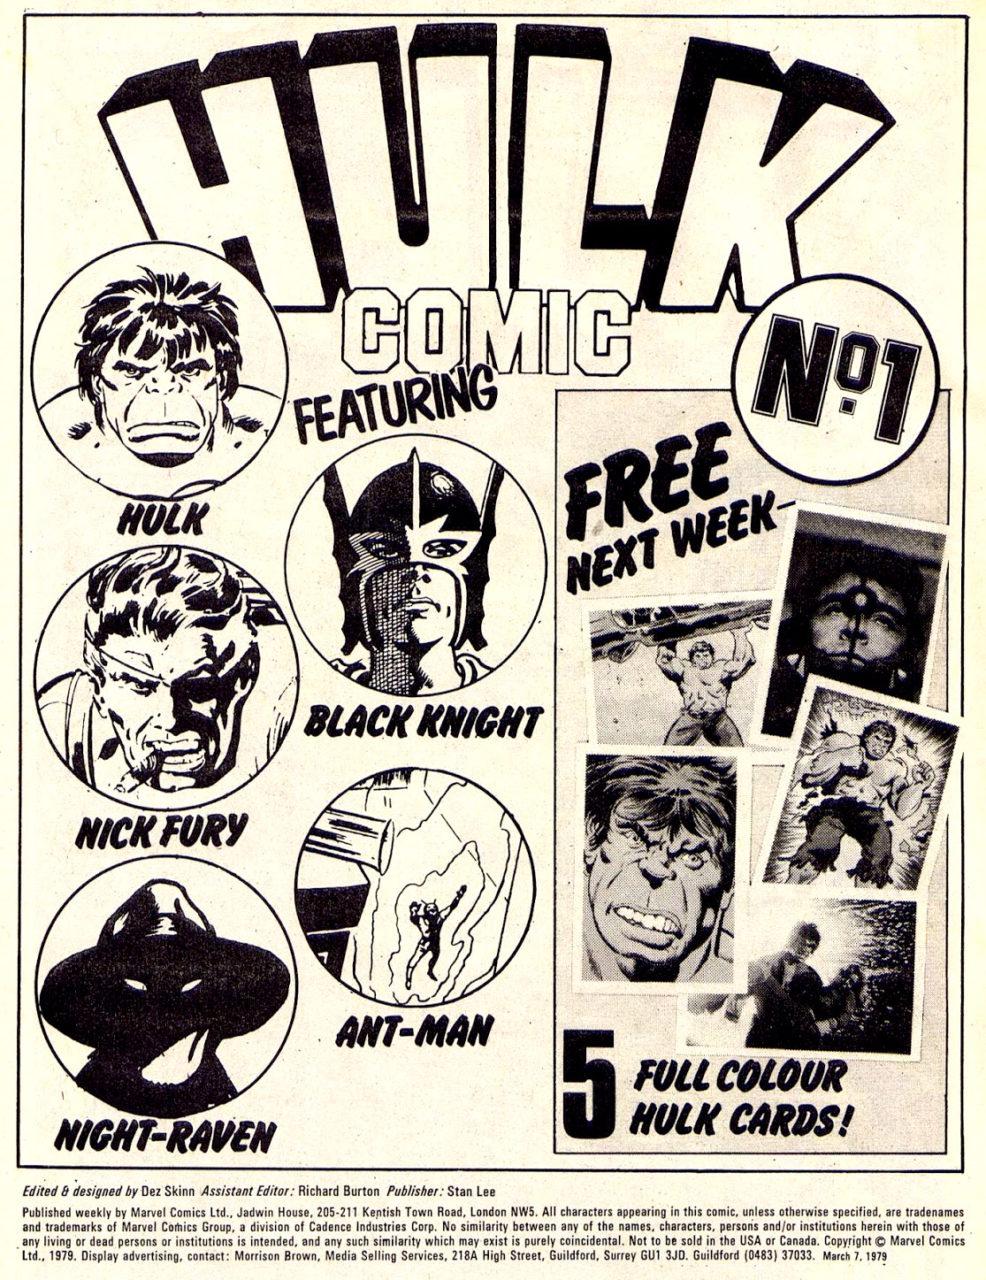 HULK COMIC intro page, 1979, Marvel UK, designed & edited by Dez Skinn